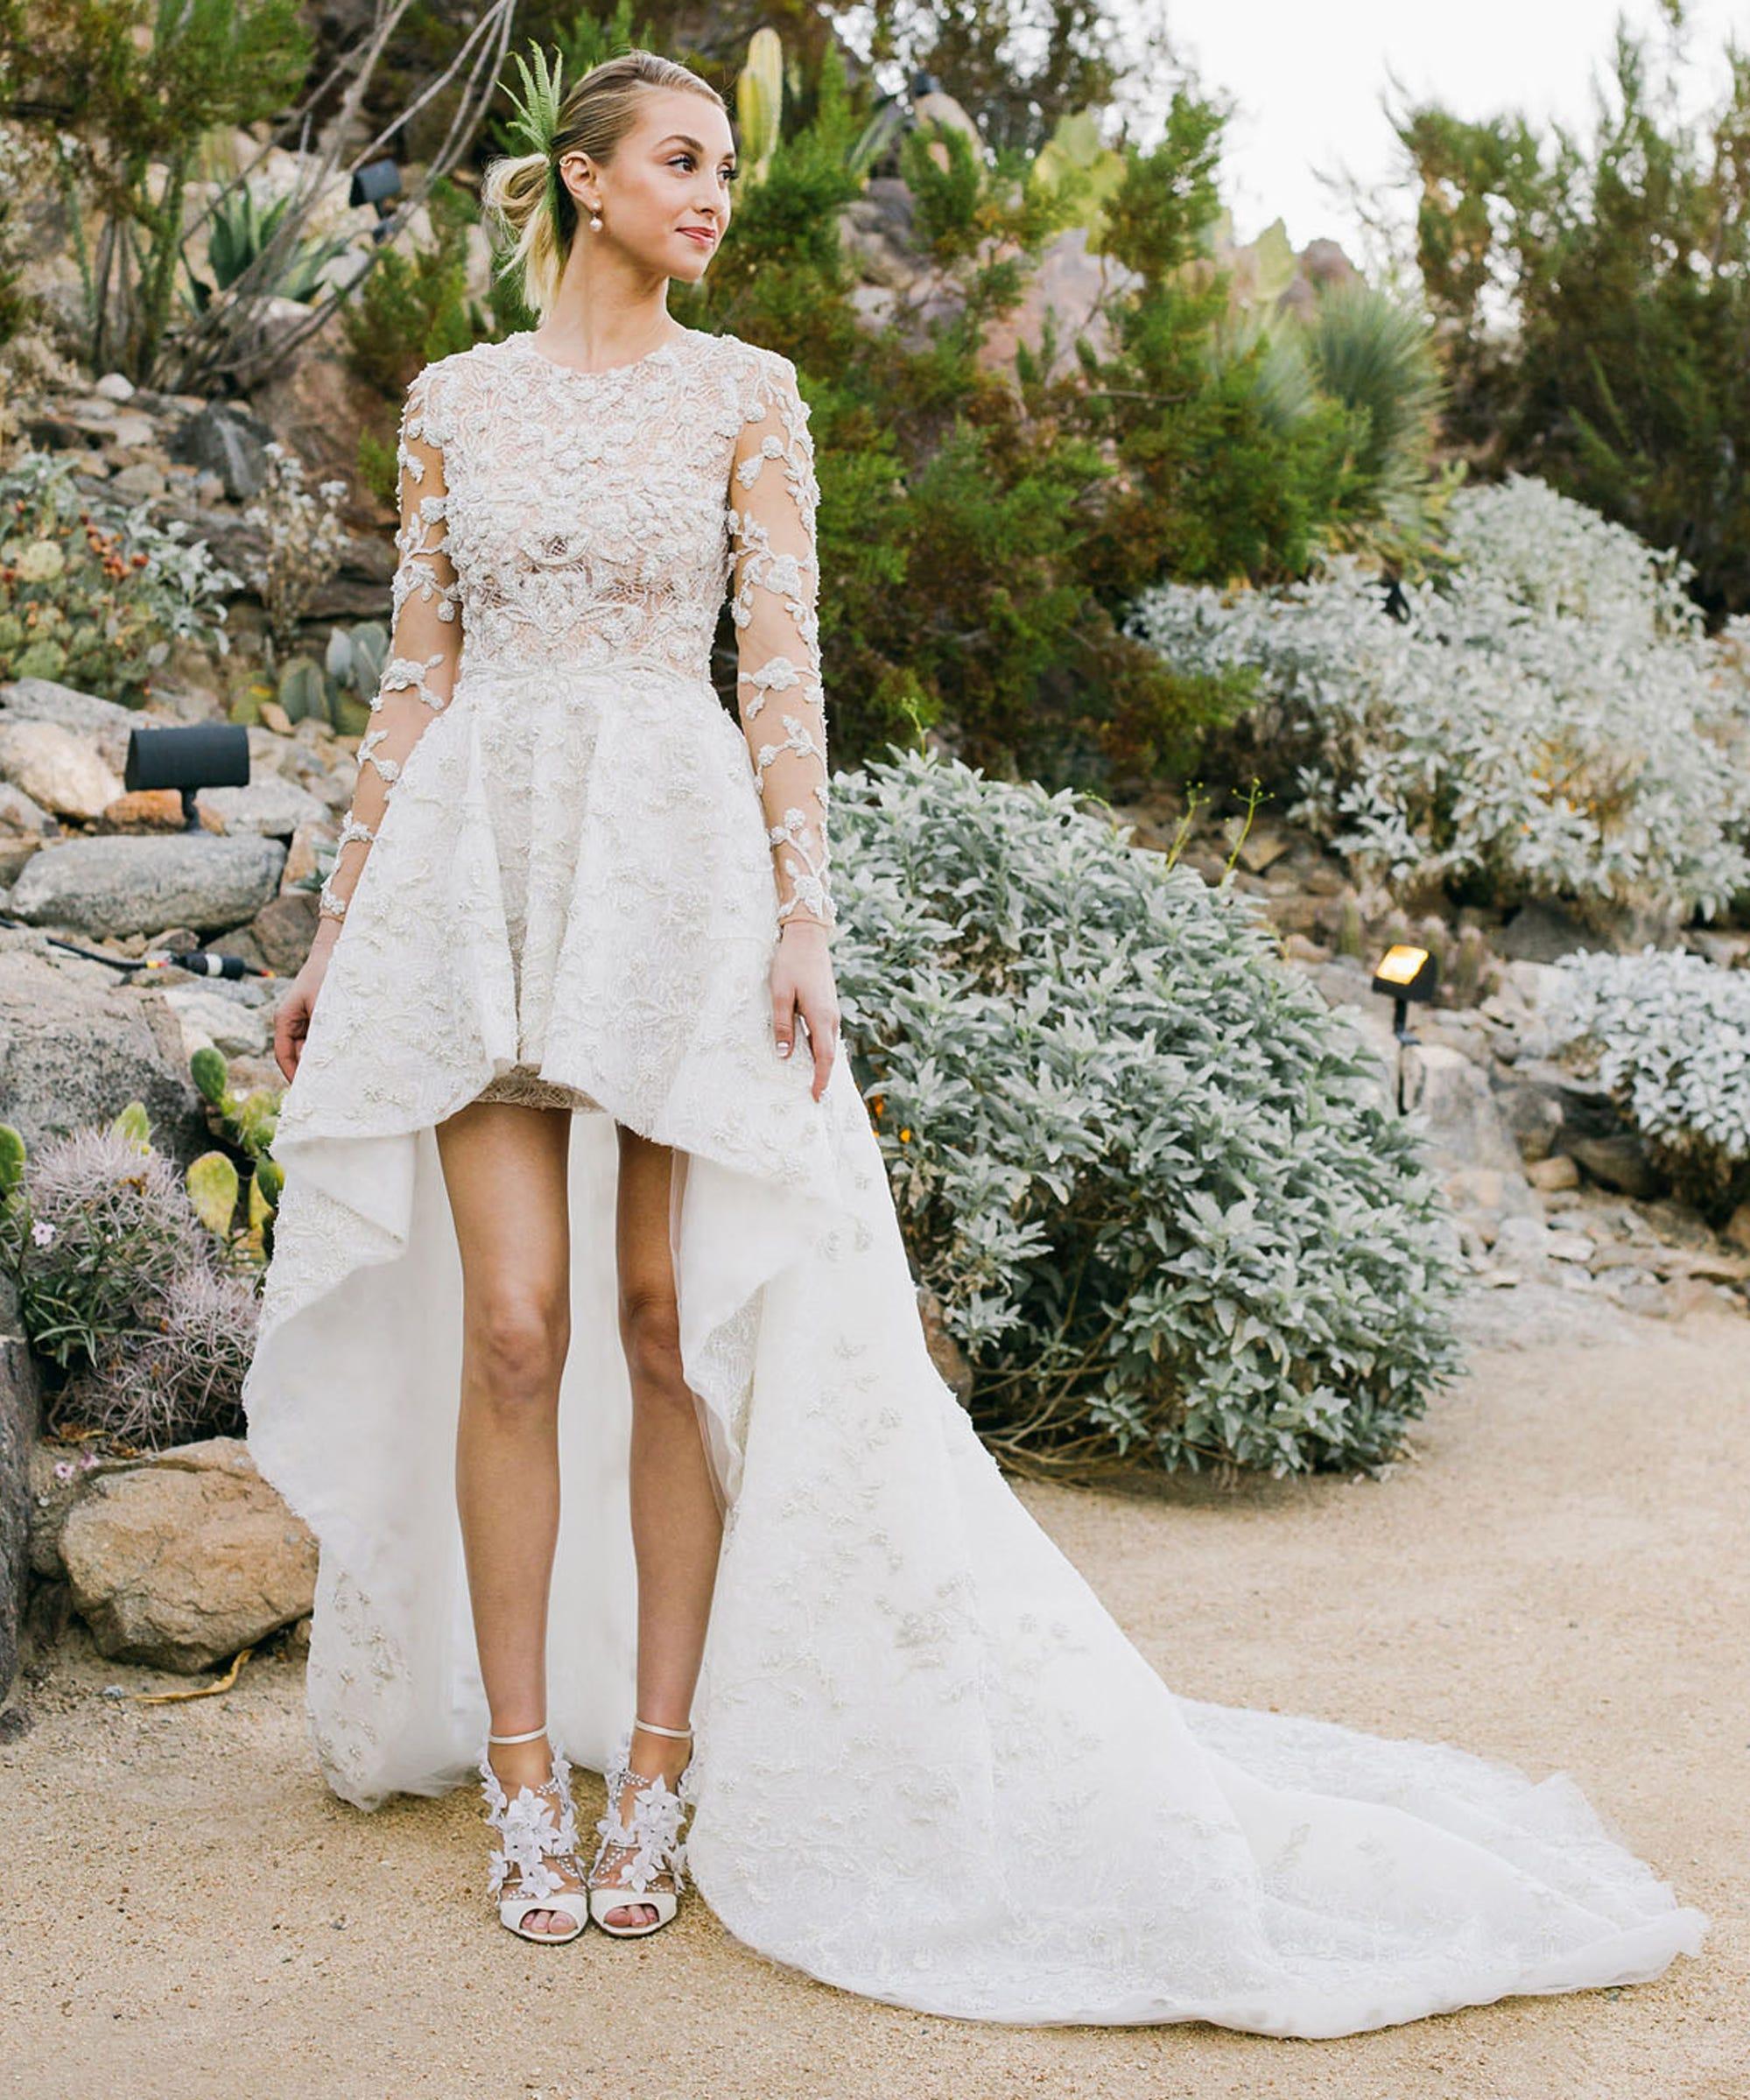 Reality TV Star Wedding Dresses